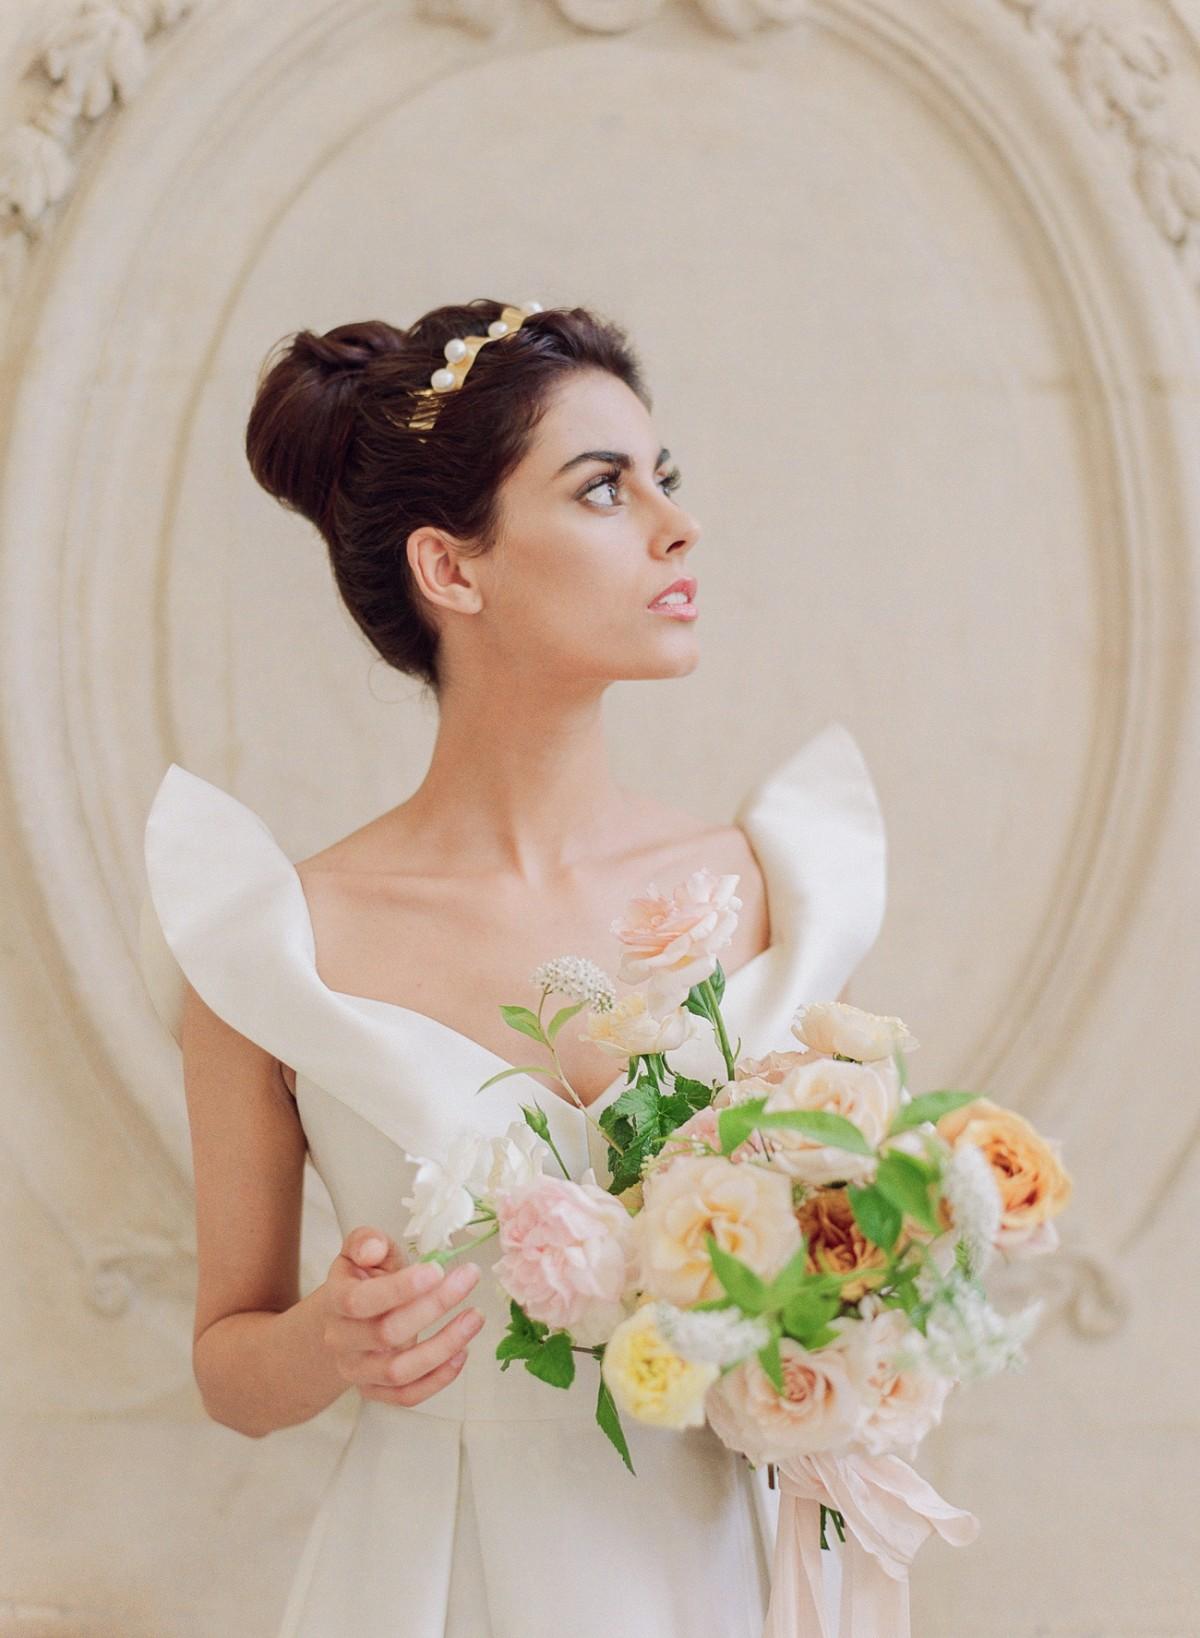 Bridal Inspiration Amongst The Paris Roses